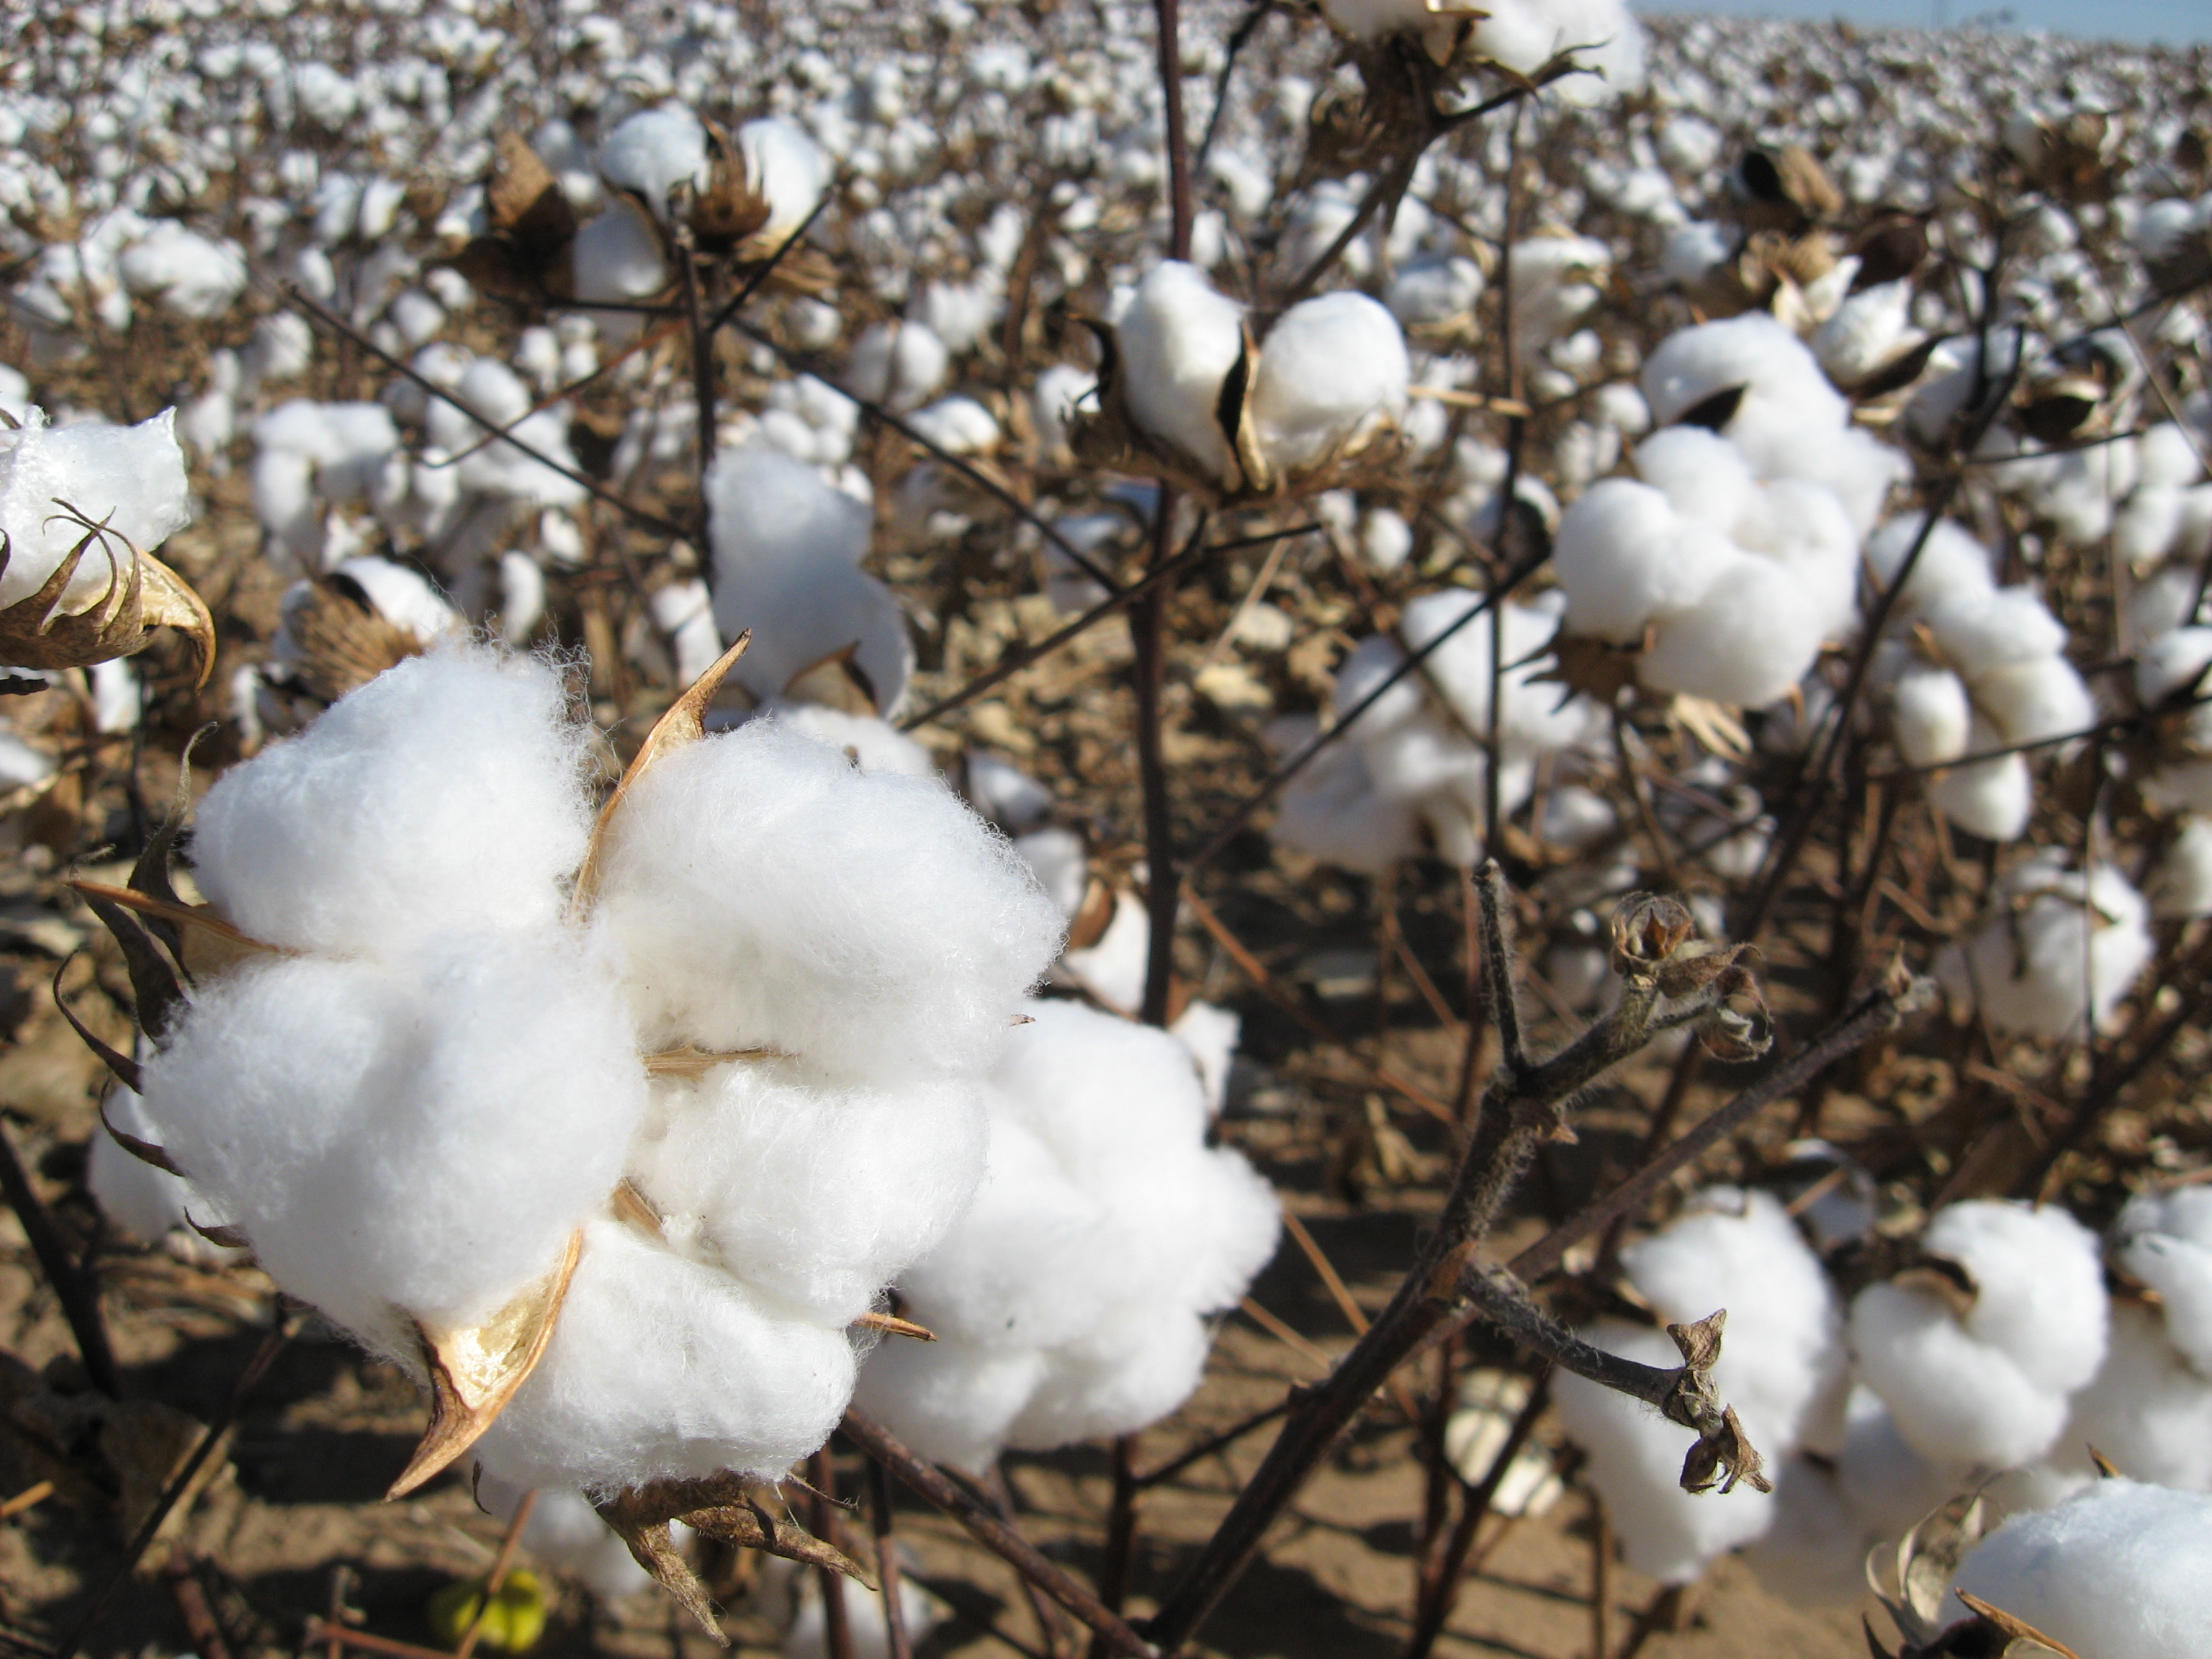 File:Cotton field kv05.jpg - Wikimedia Commons